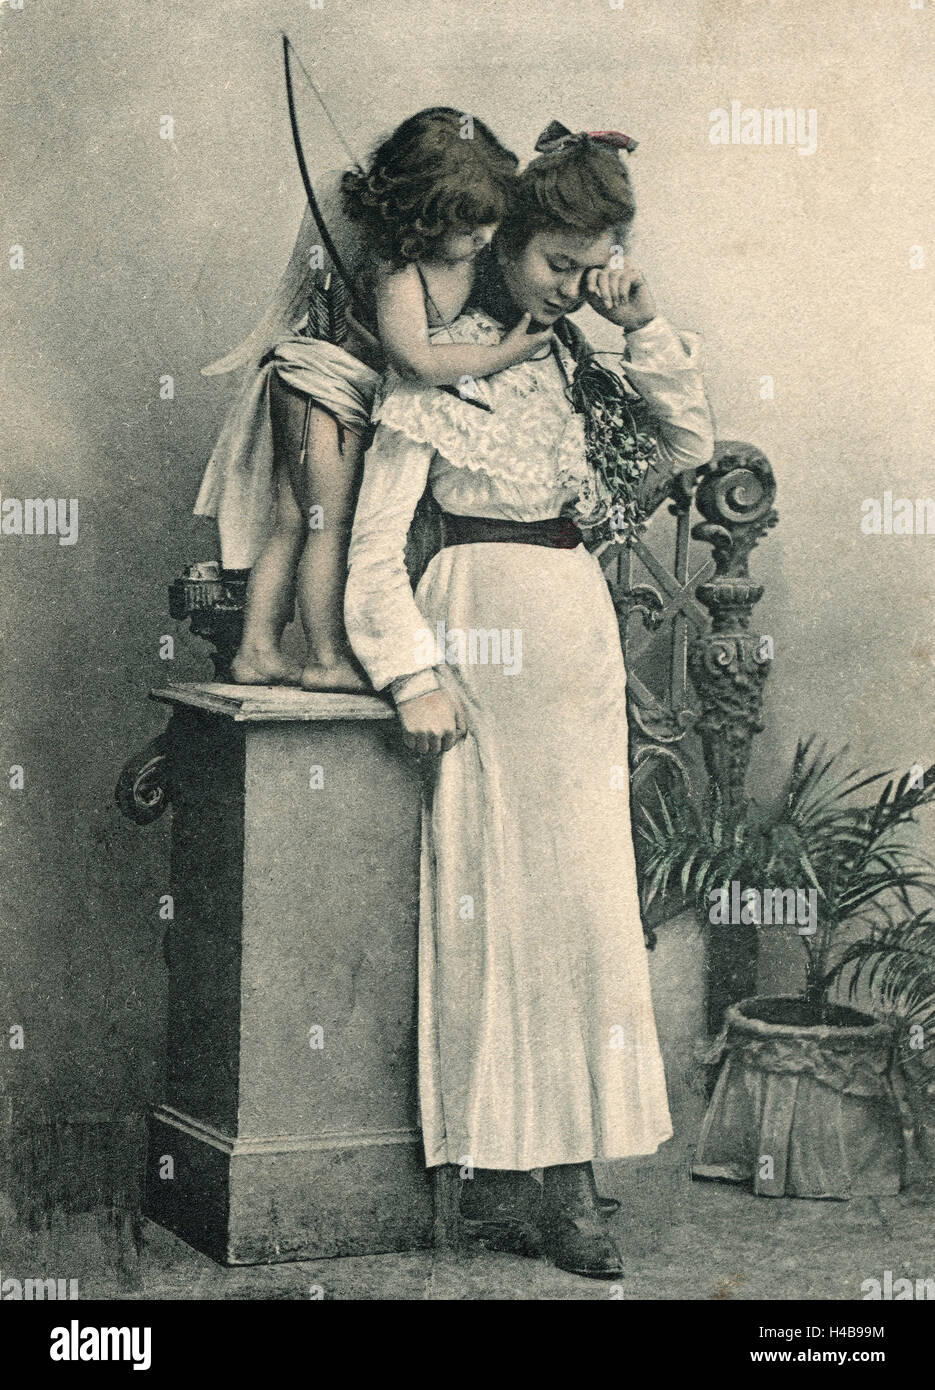 Postcard, históricos, Amor comodidades joven, b/w, Imagen De Stock